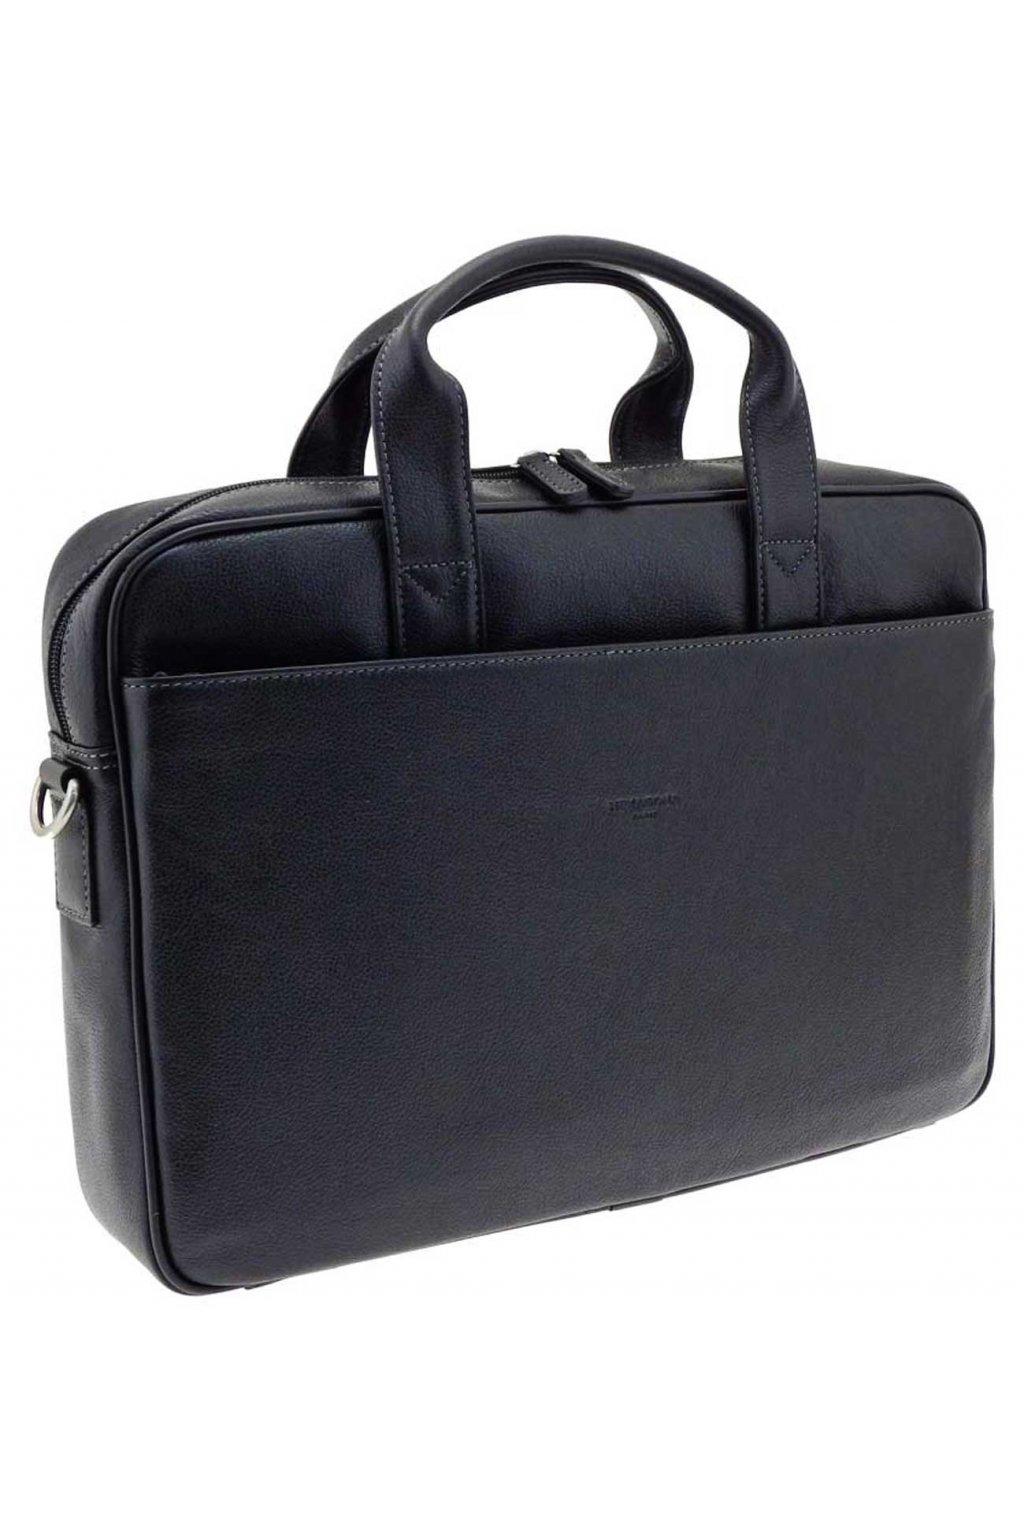 panska taska kozena cerna PTK03 462544 C 1